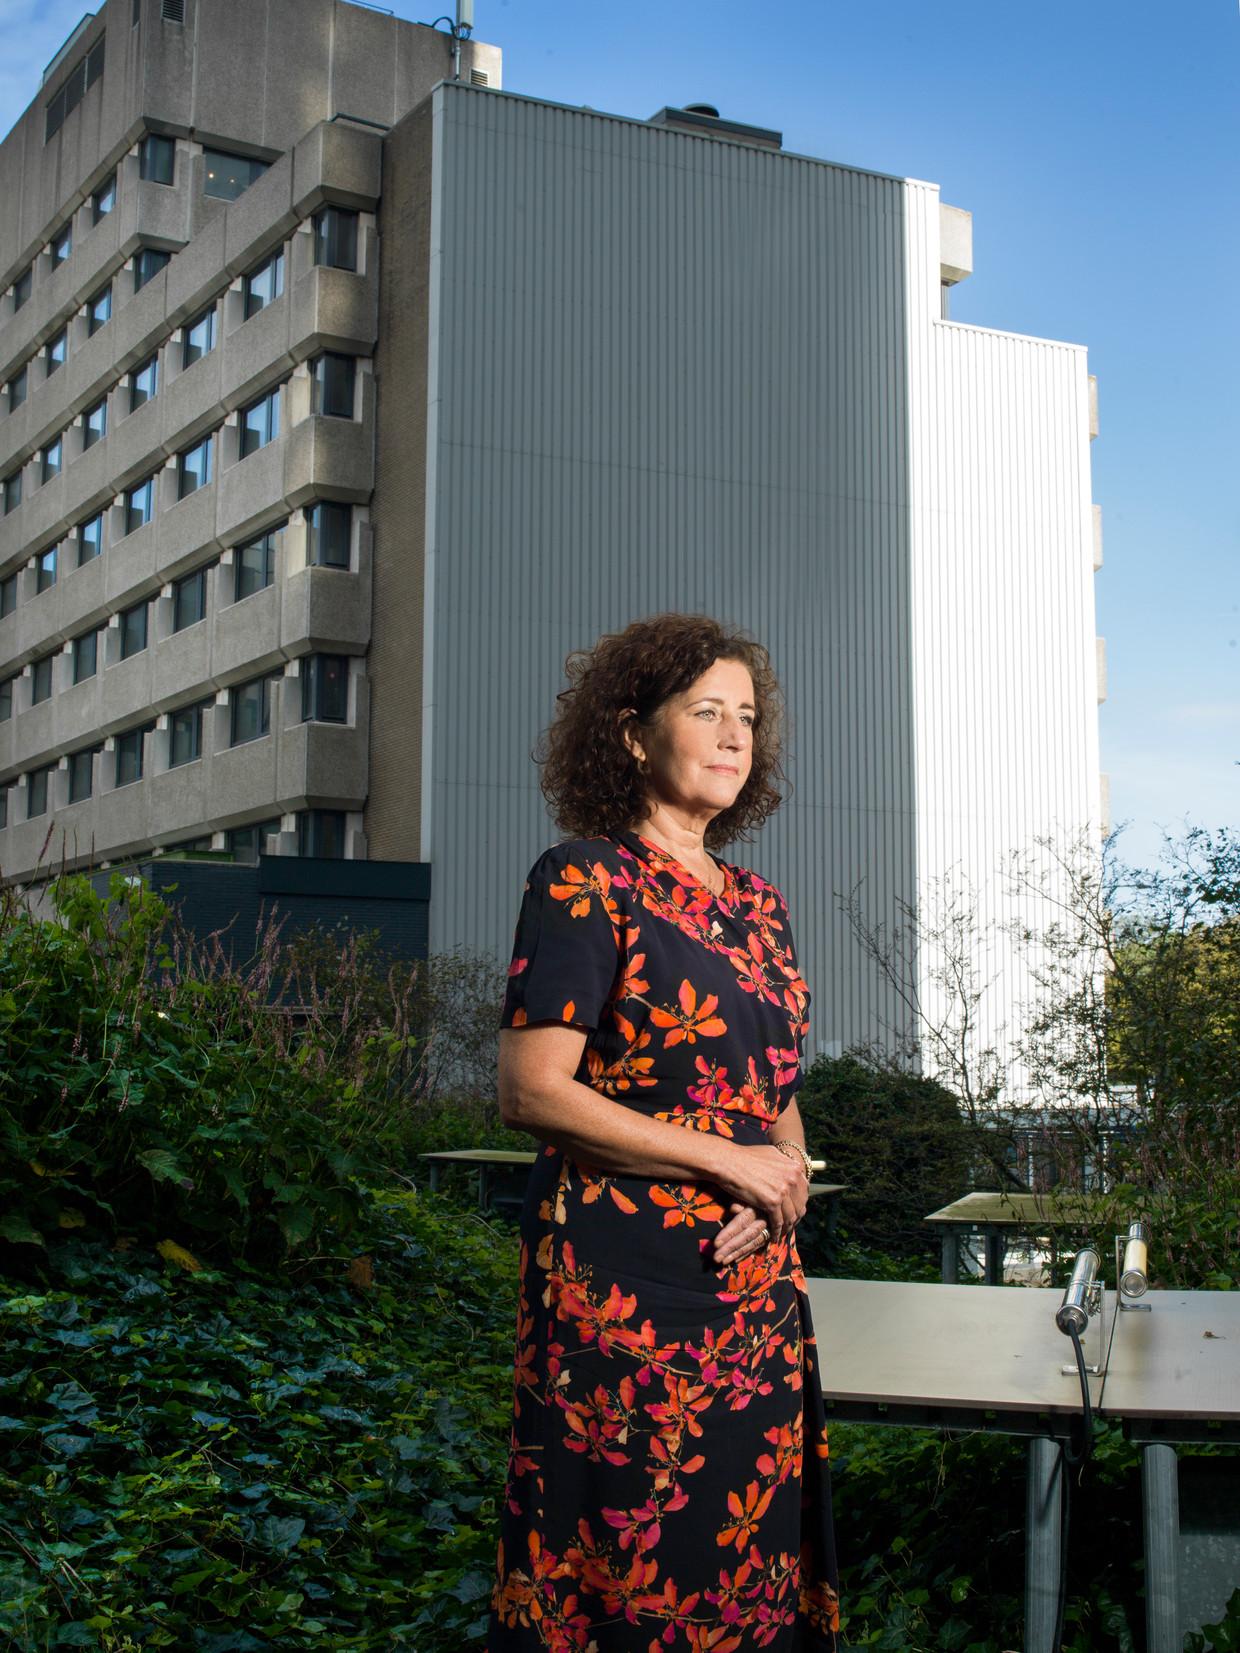 Minister van Cultuur Ingrid van Engelshoven. Beeld Eva Roefs